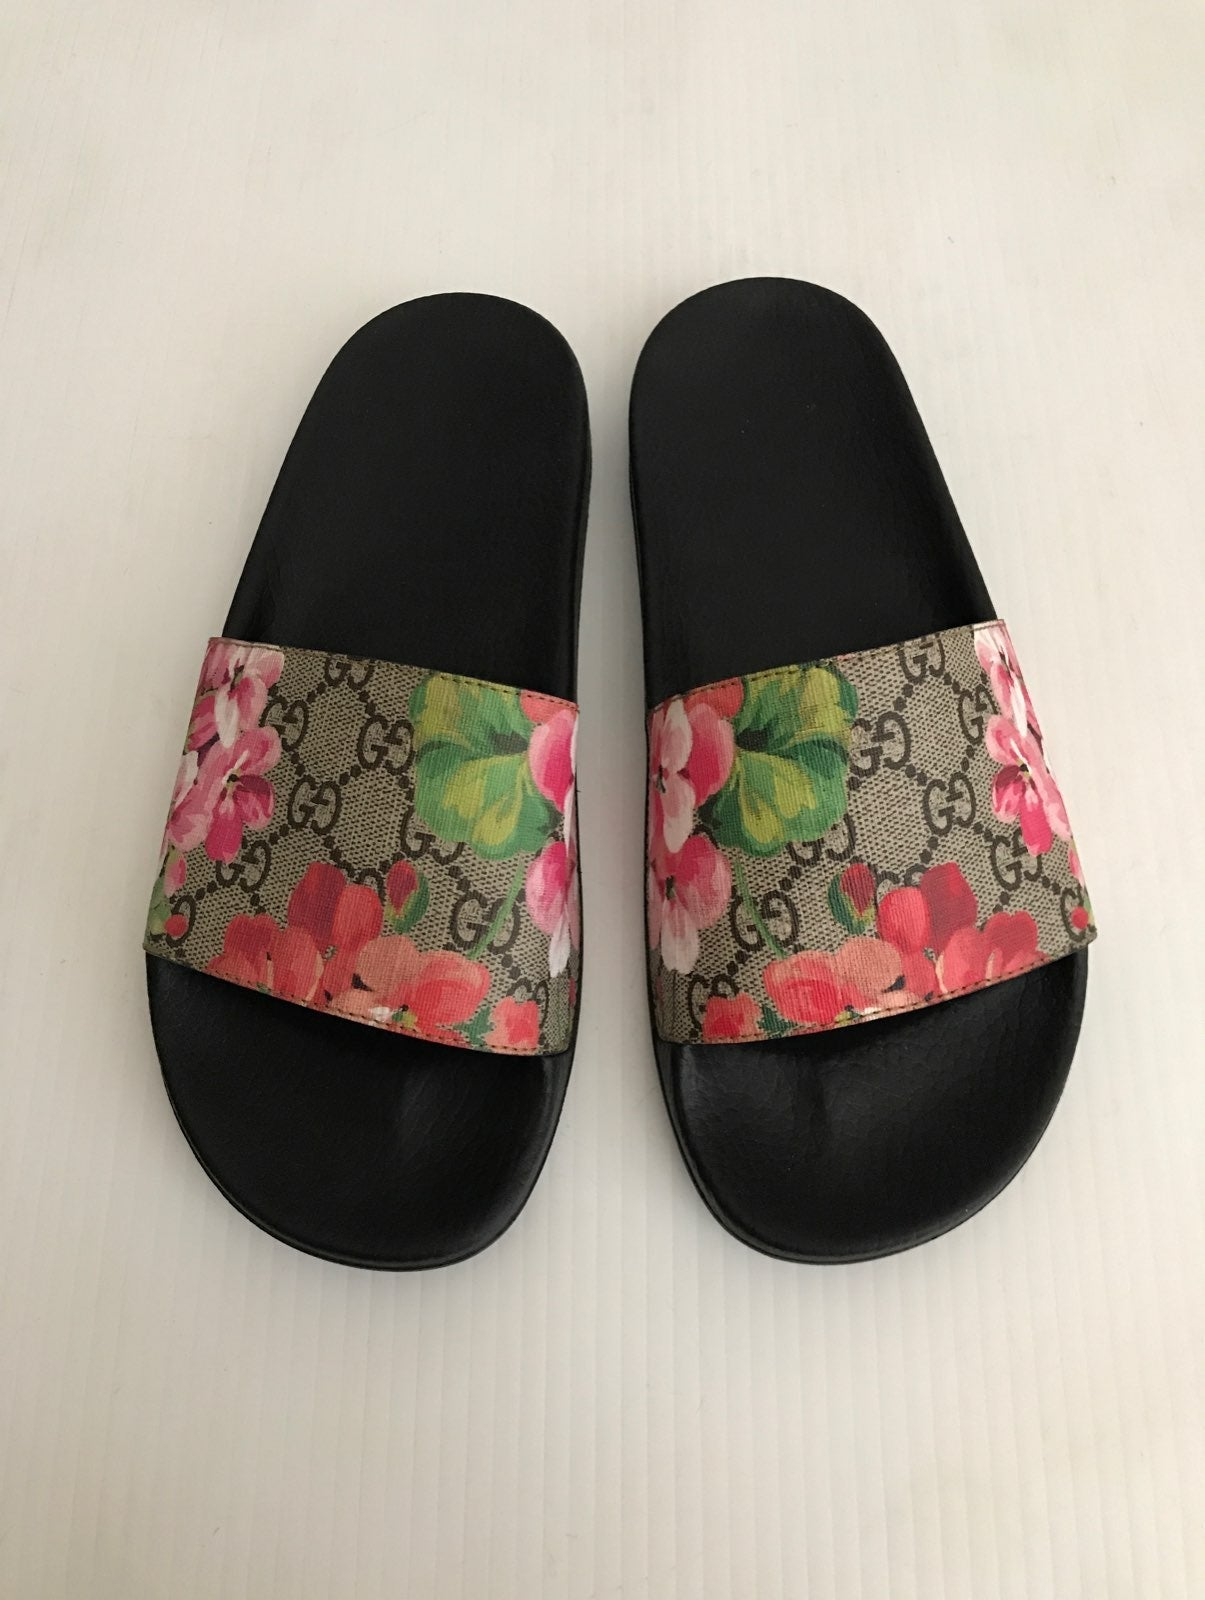 Gucci GG Bloom Pursuit Slide Sandal 38